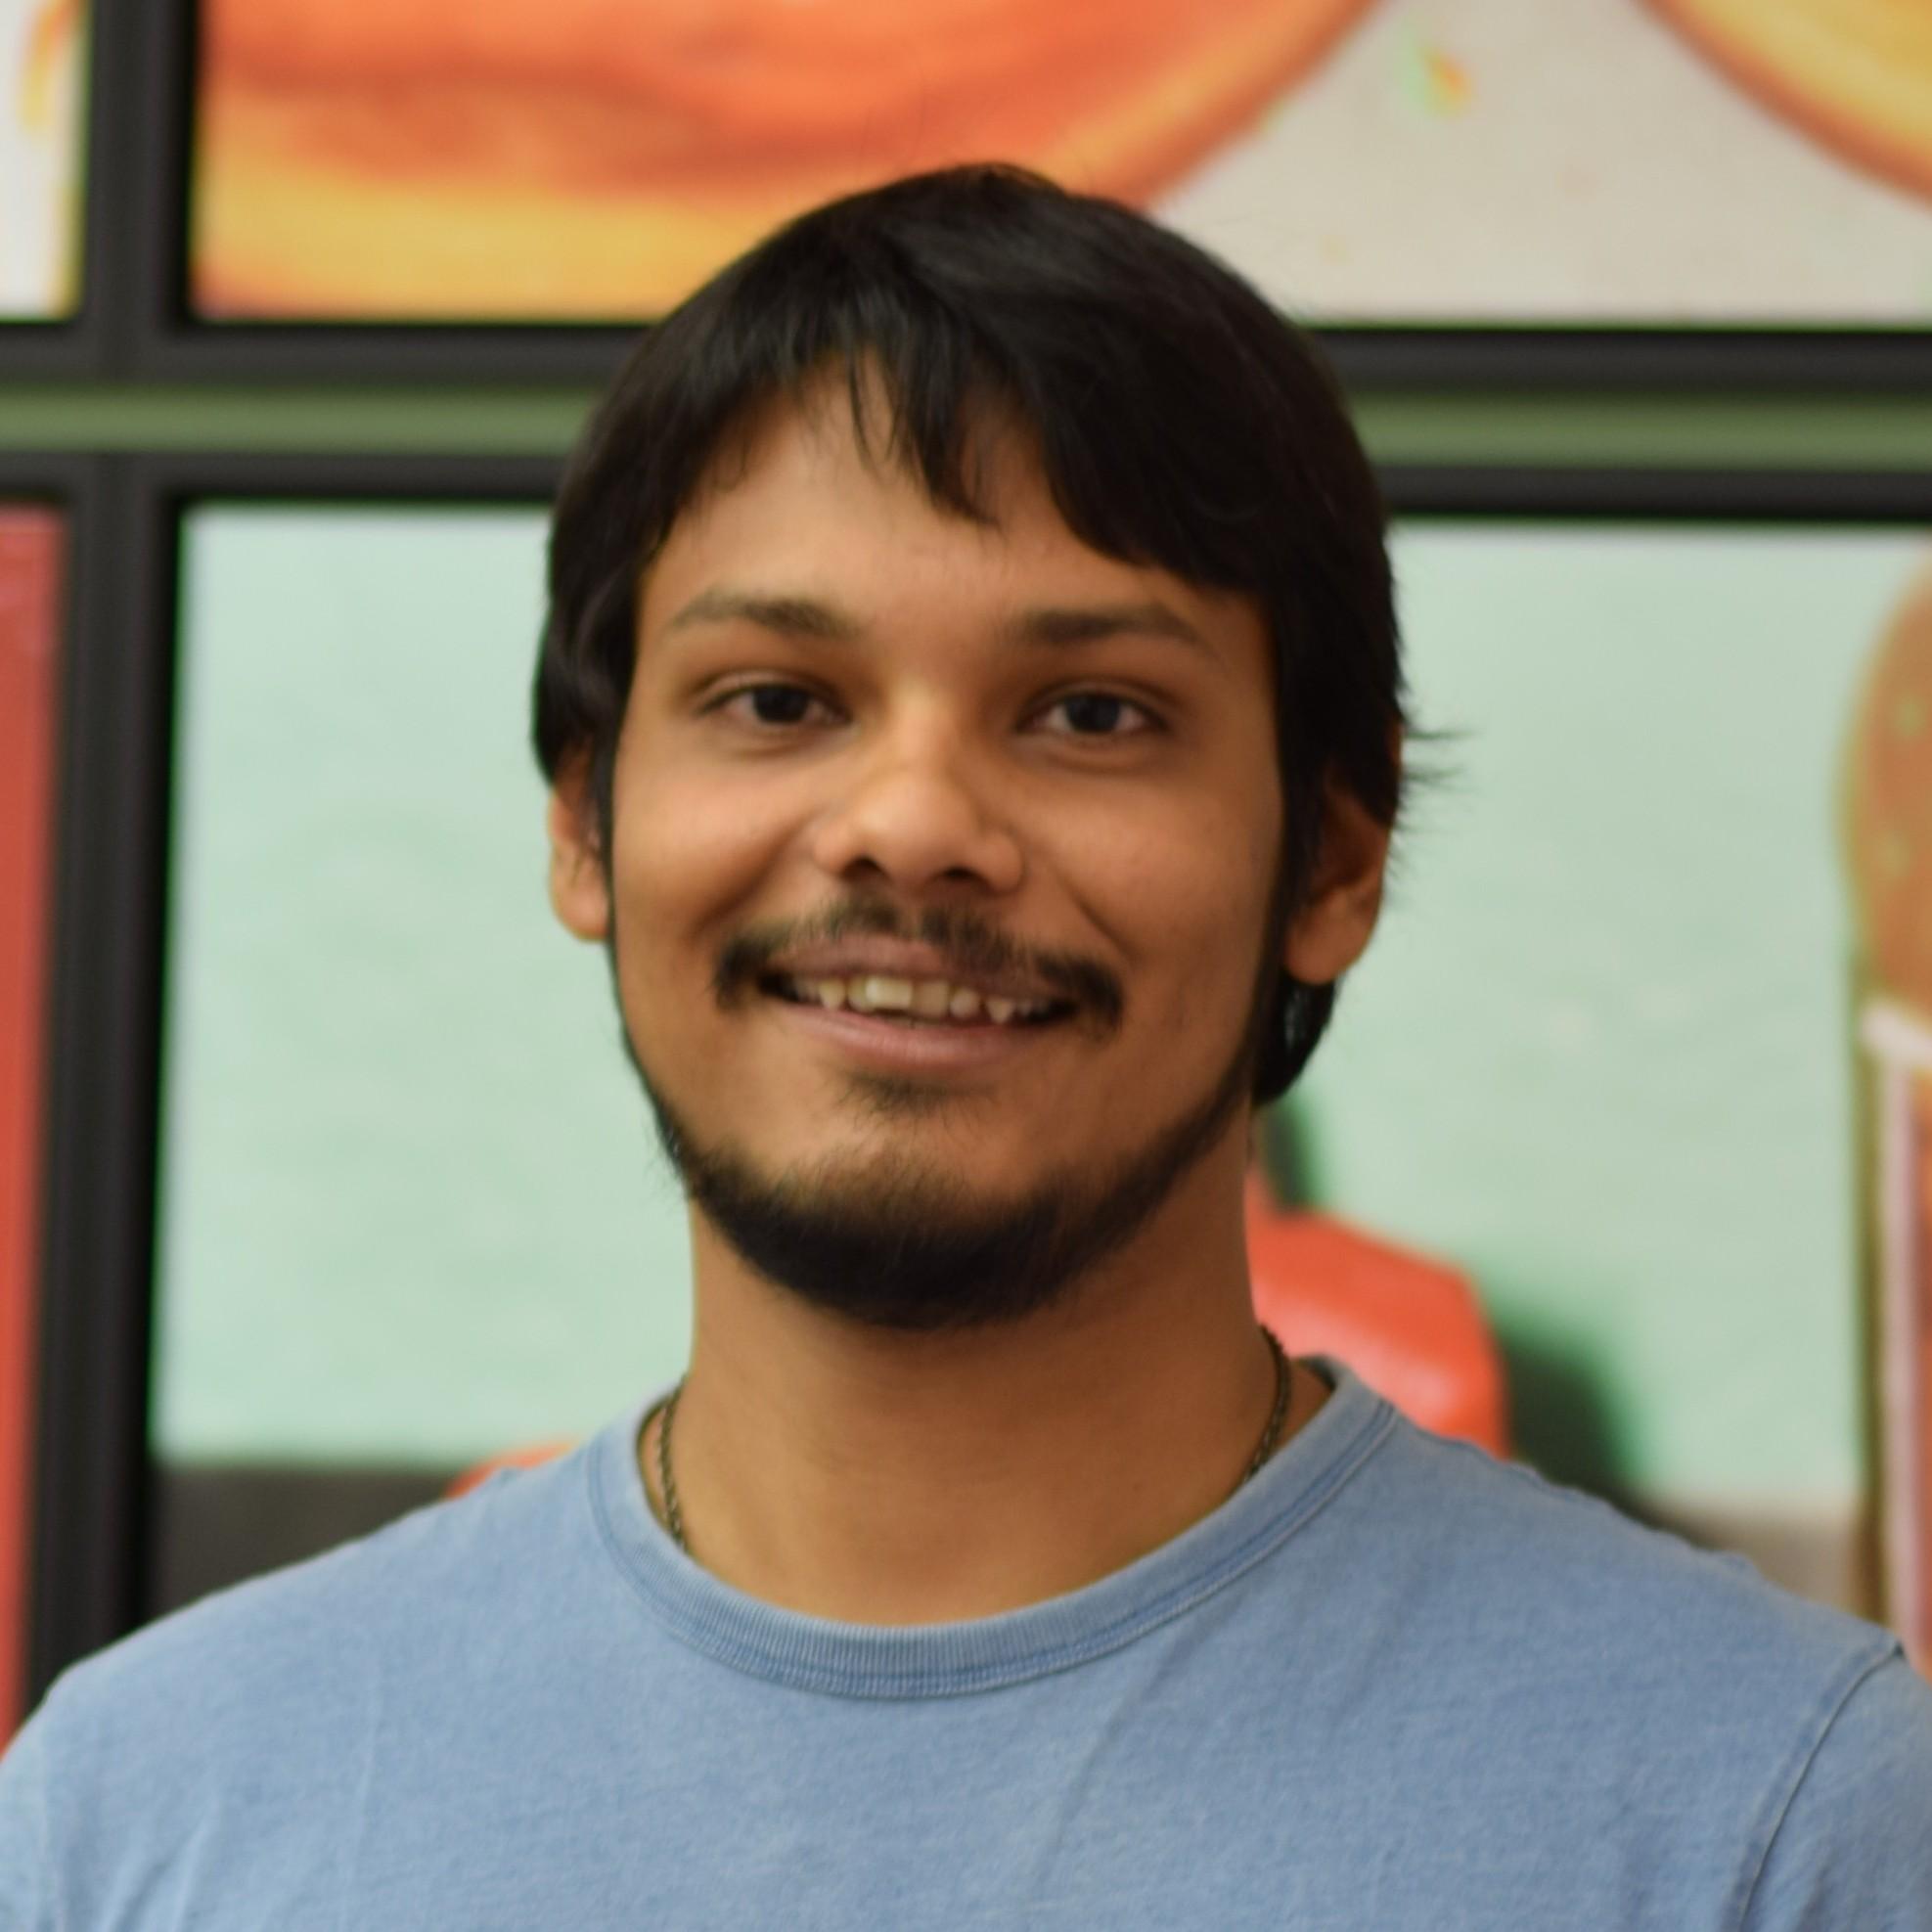 Headshot of the course instructor Dibya Chakravorty